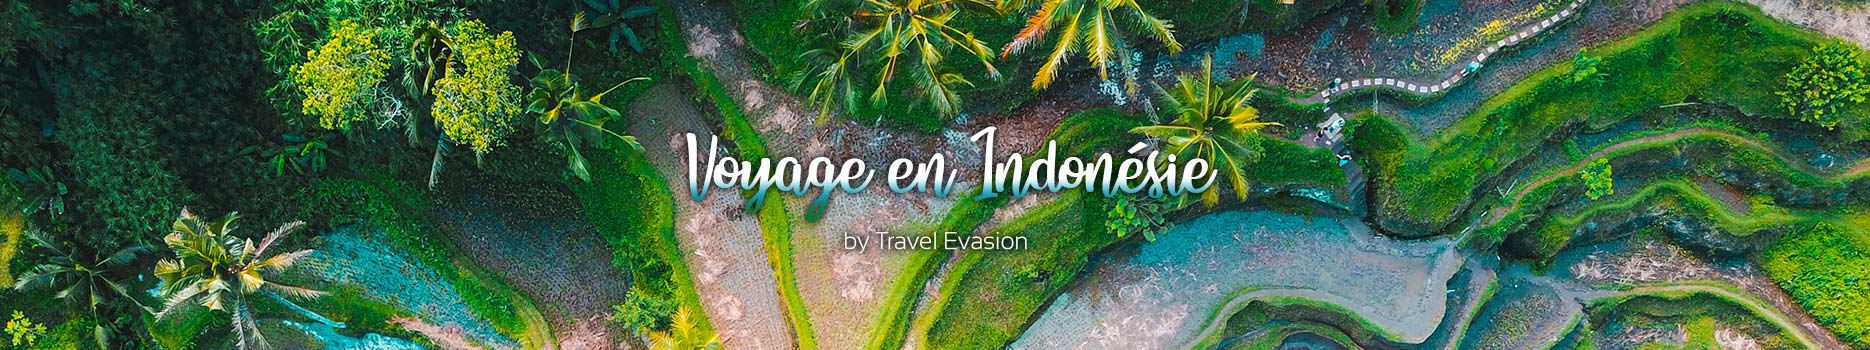 Voyage en Indonésie, séjour à Bali ou circuit